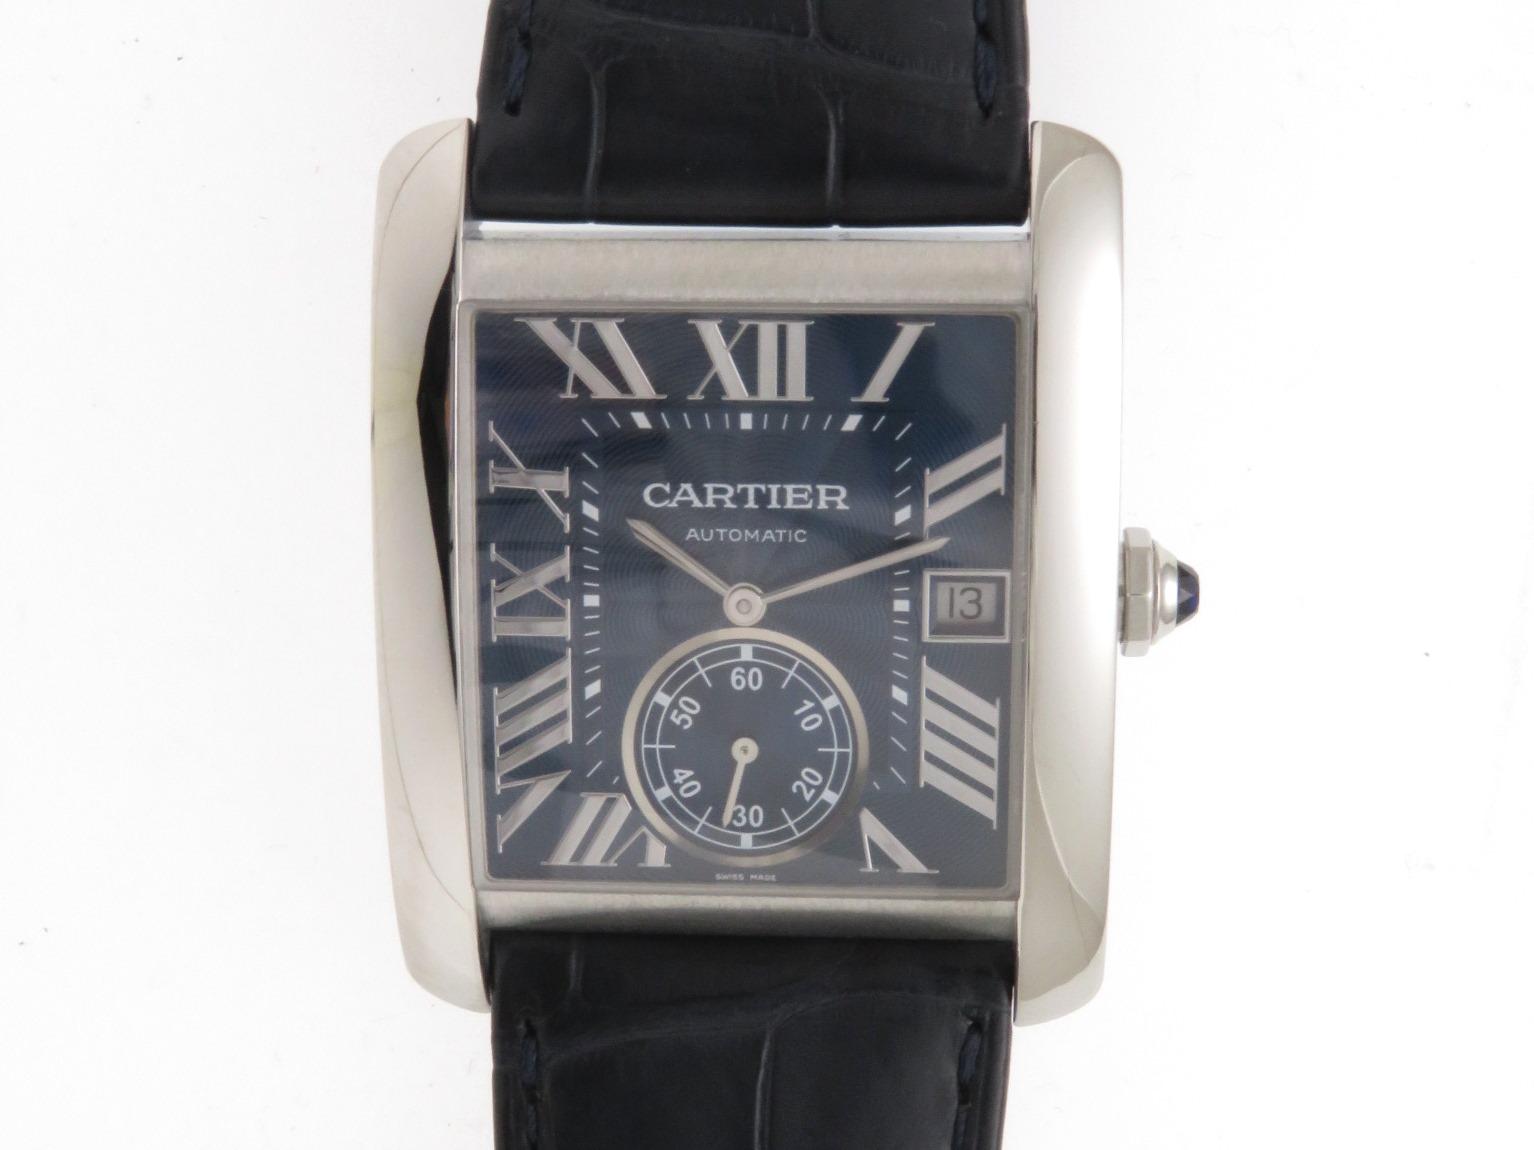 Cartier カルティエ タンクMC WSTA0010 自動巻き ネイビー/青文字盤 メンズ時計 【434】2148103228537